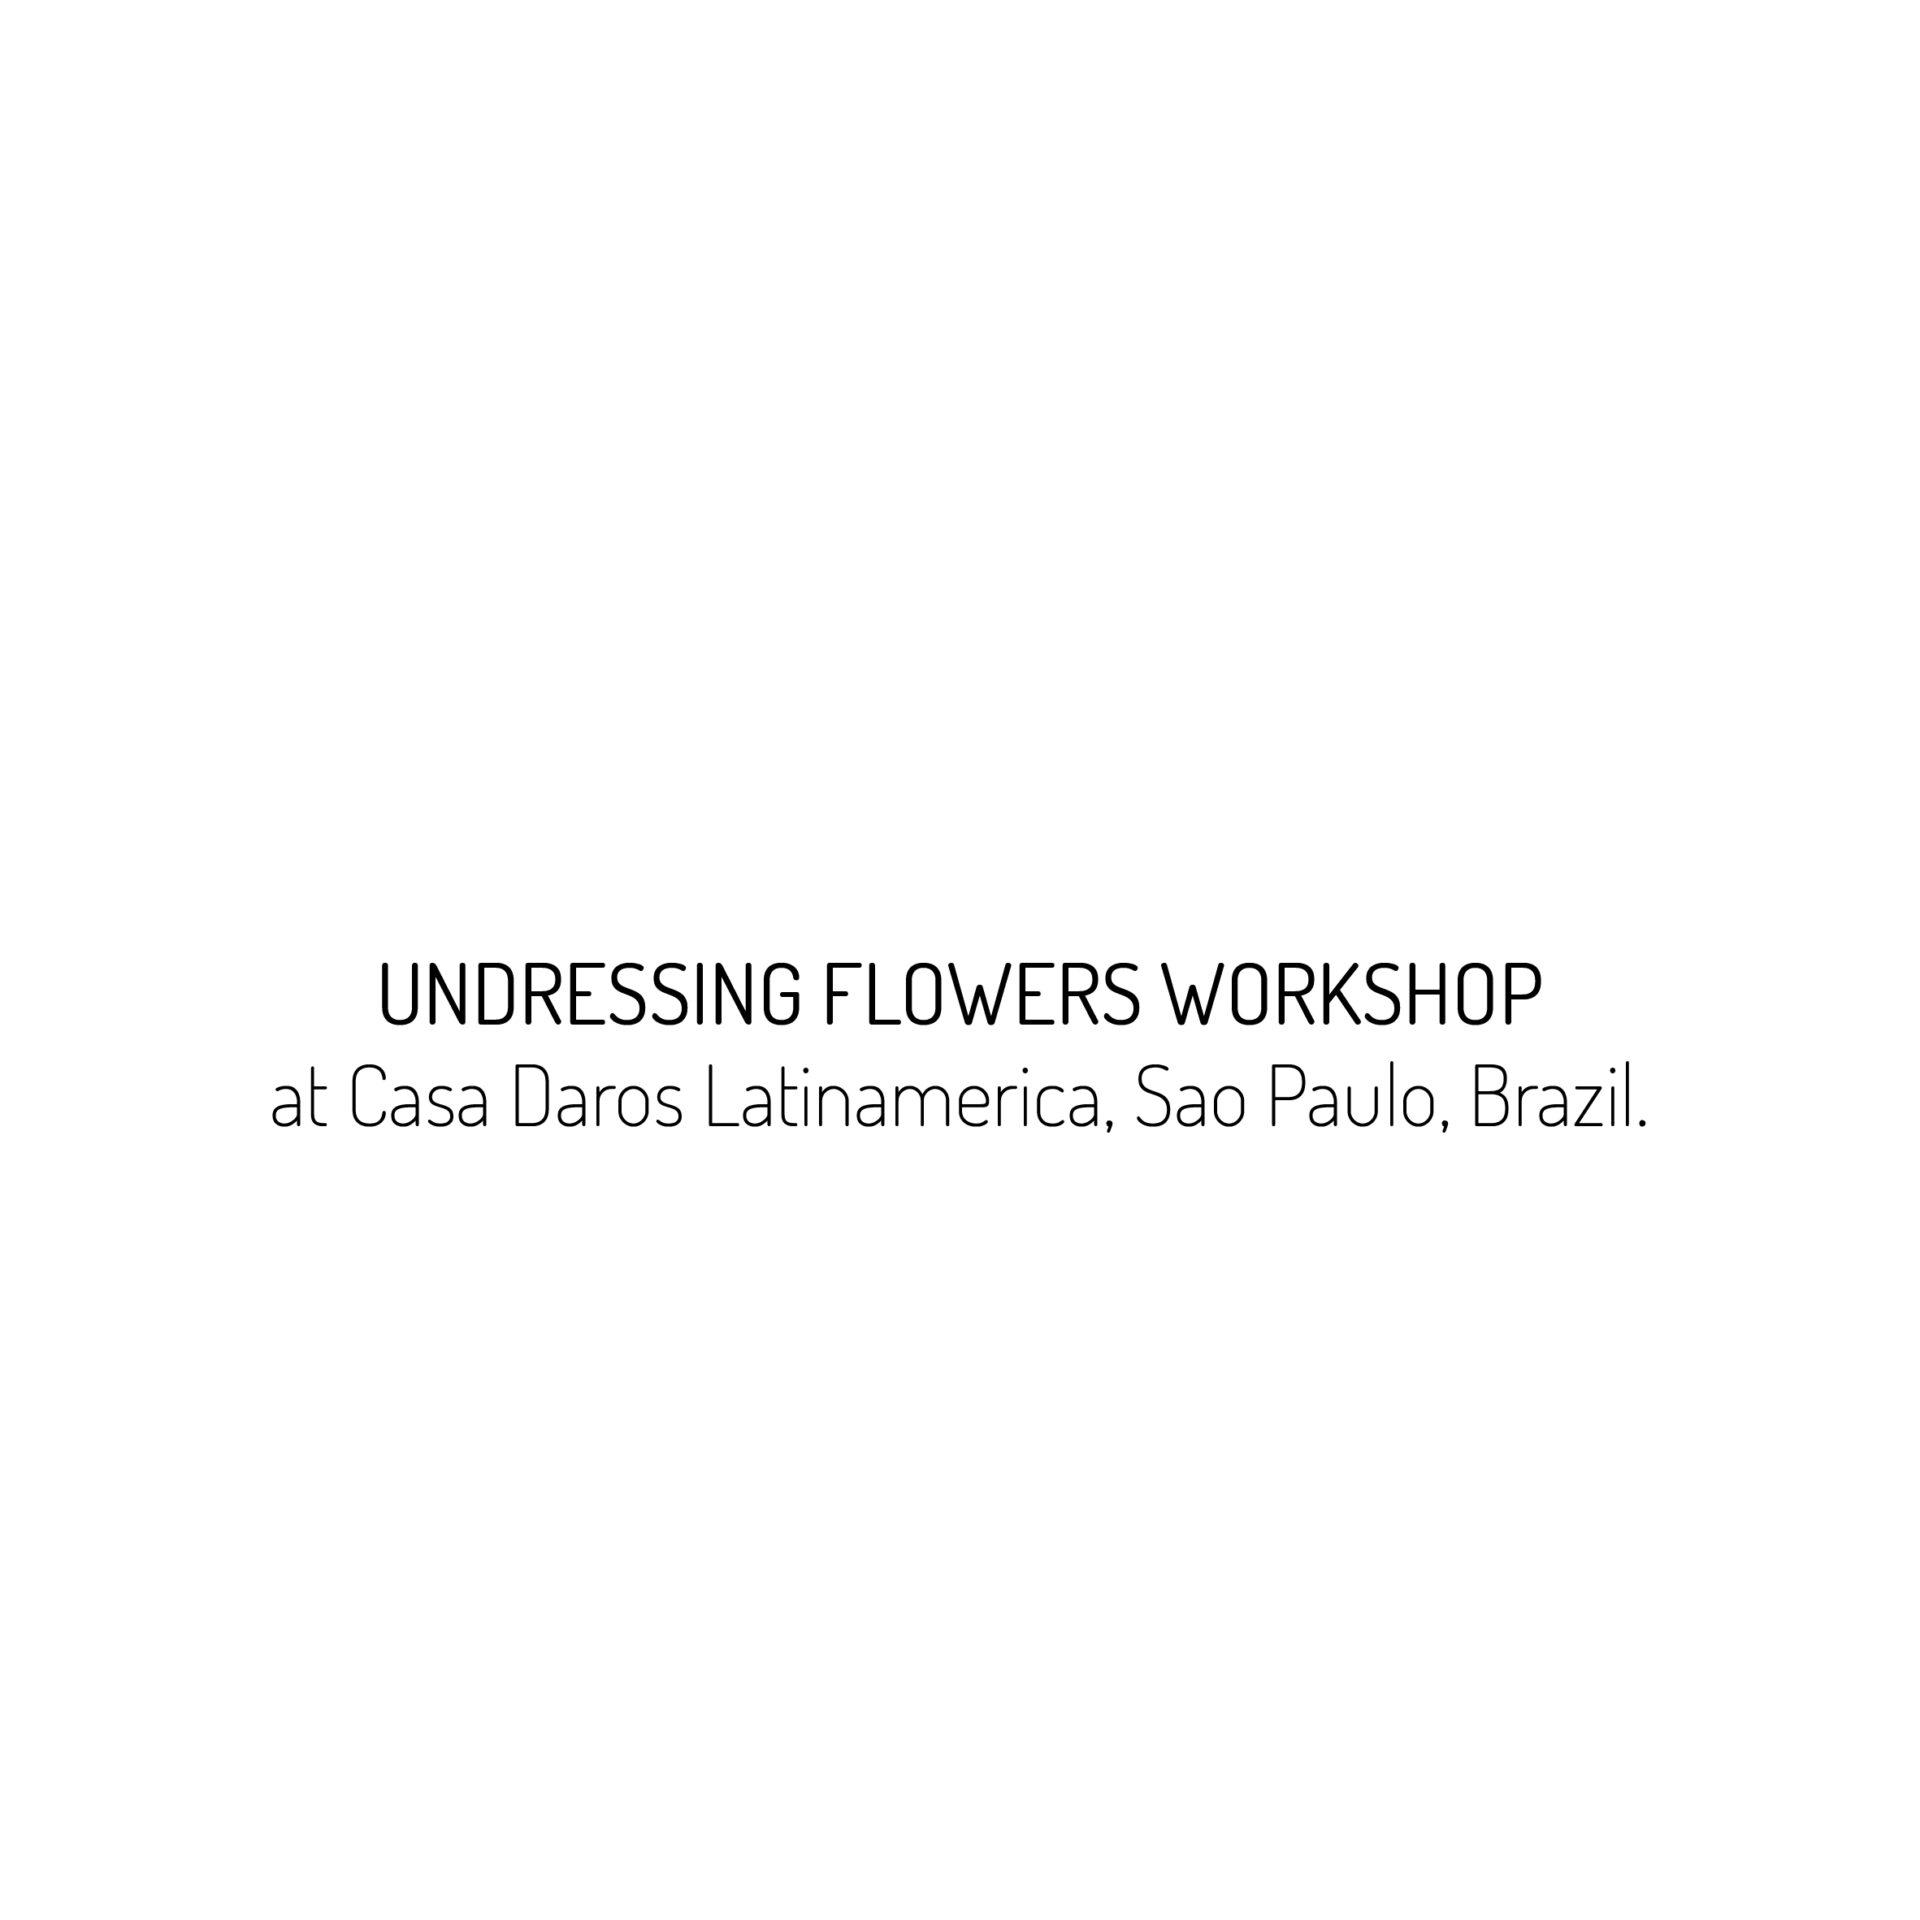 Separadores Undressing flowers workshop-01